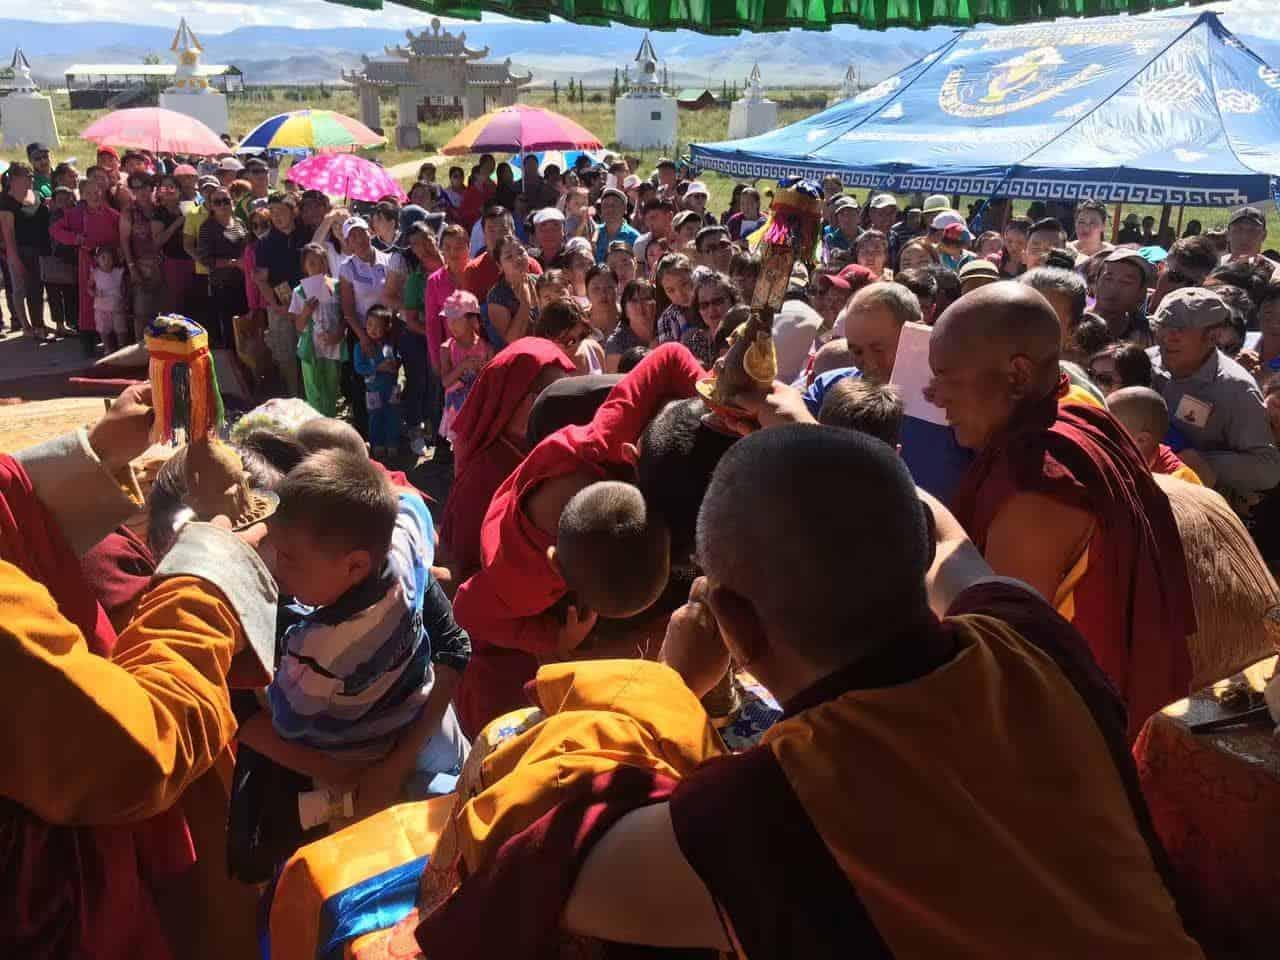 gosok-rinpoche-mongolia-2016-abf933667ffaf49682a6a2d394bb16e